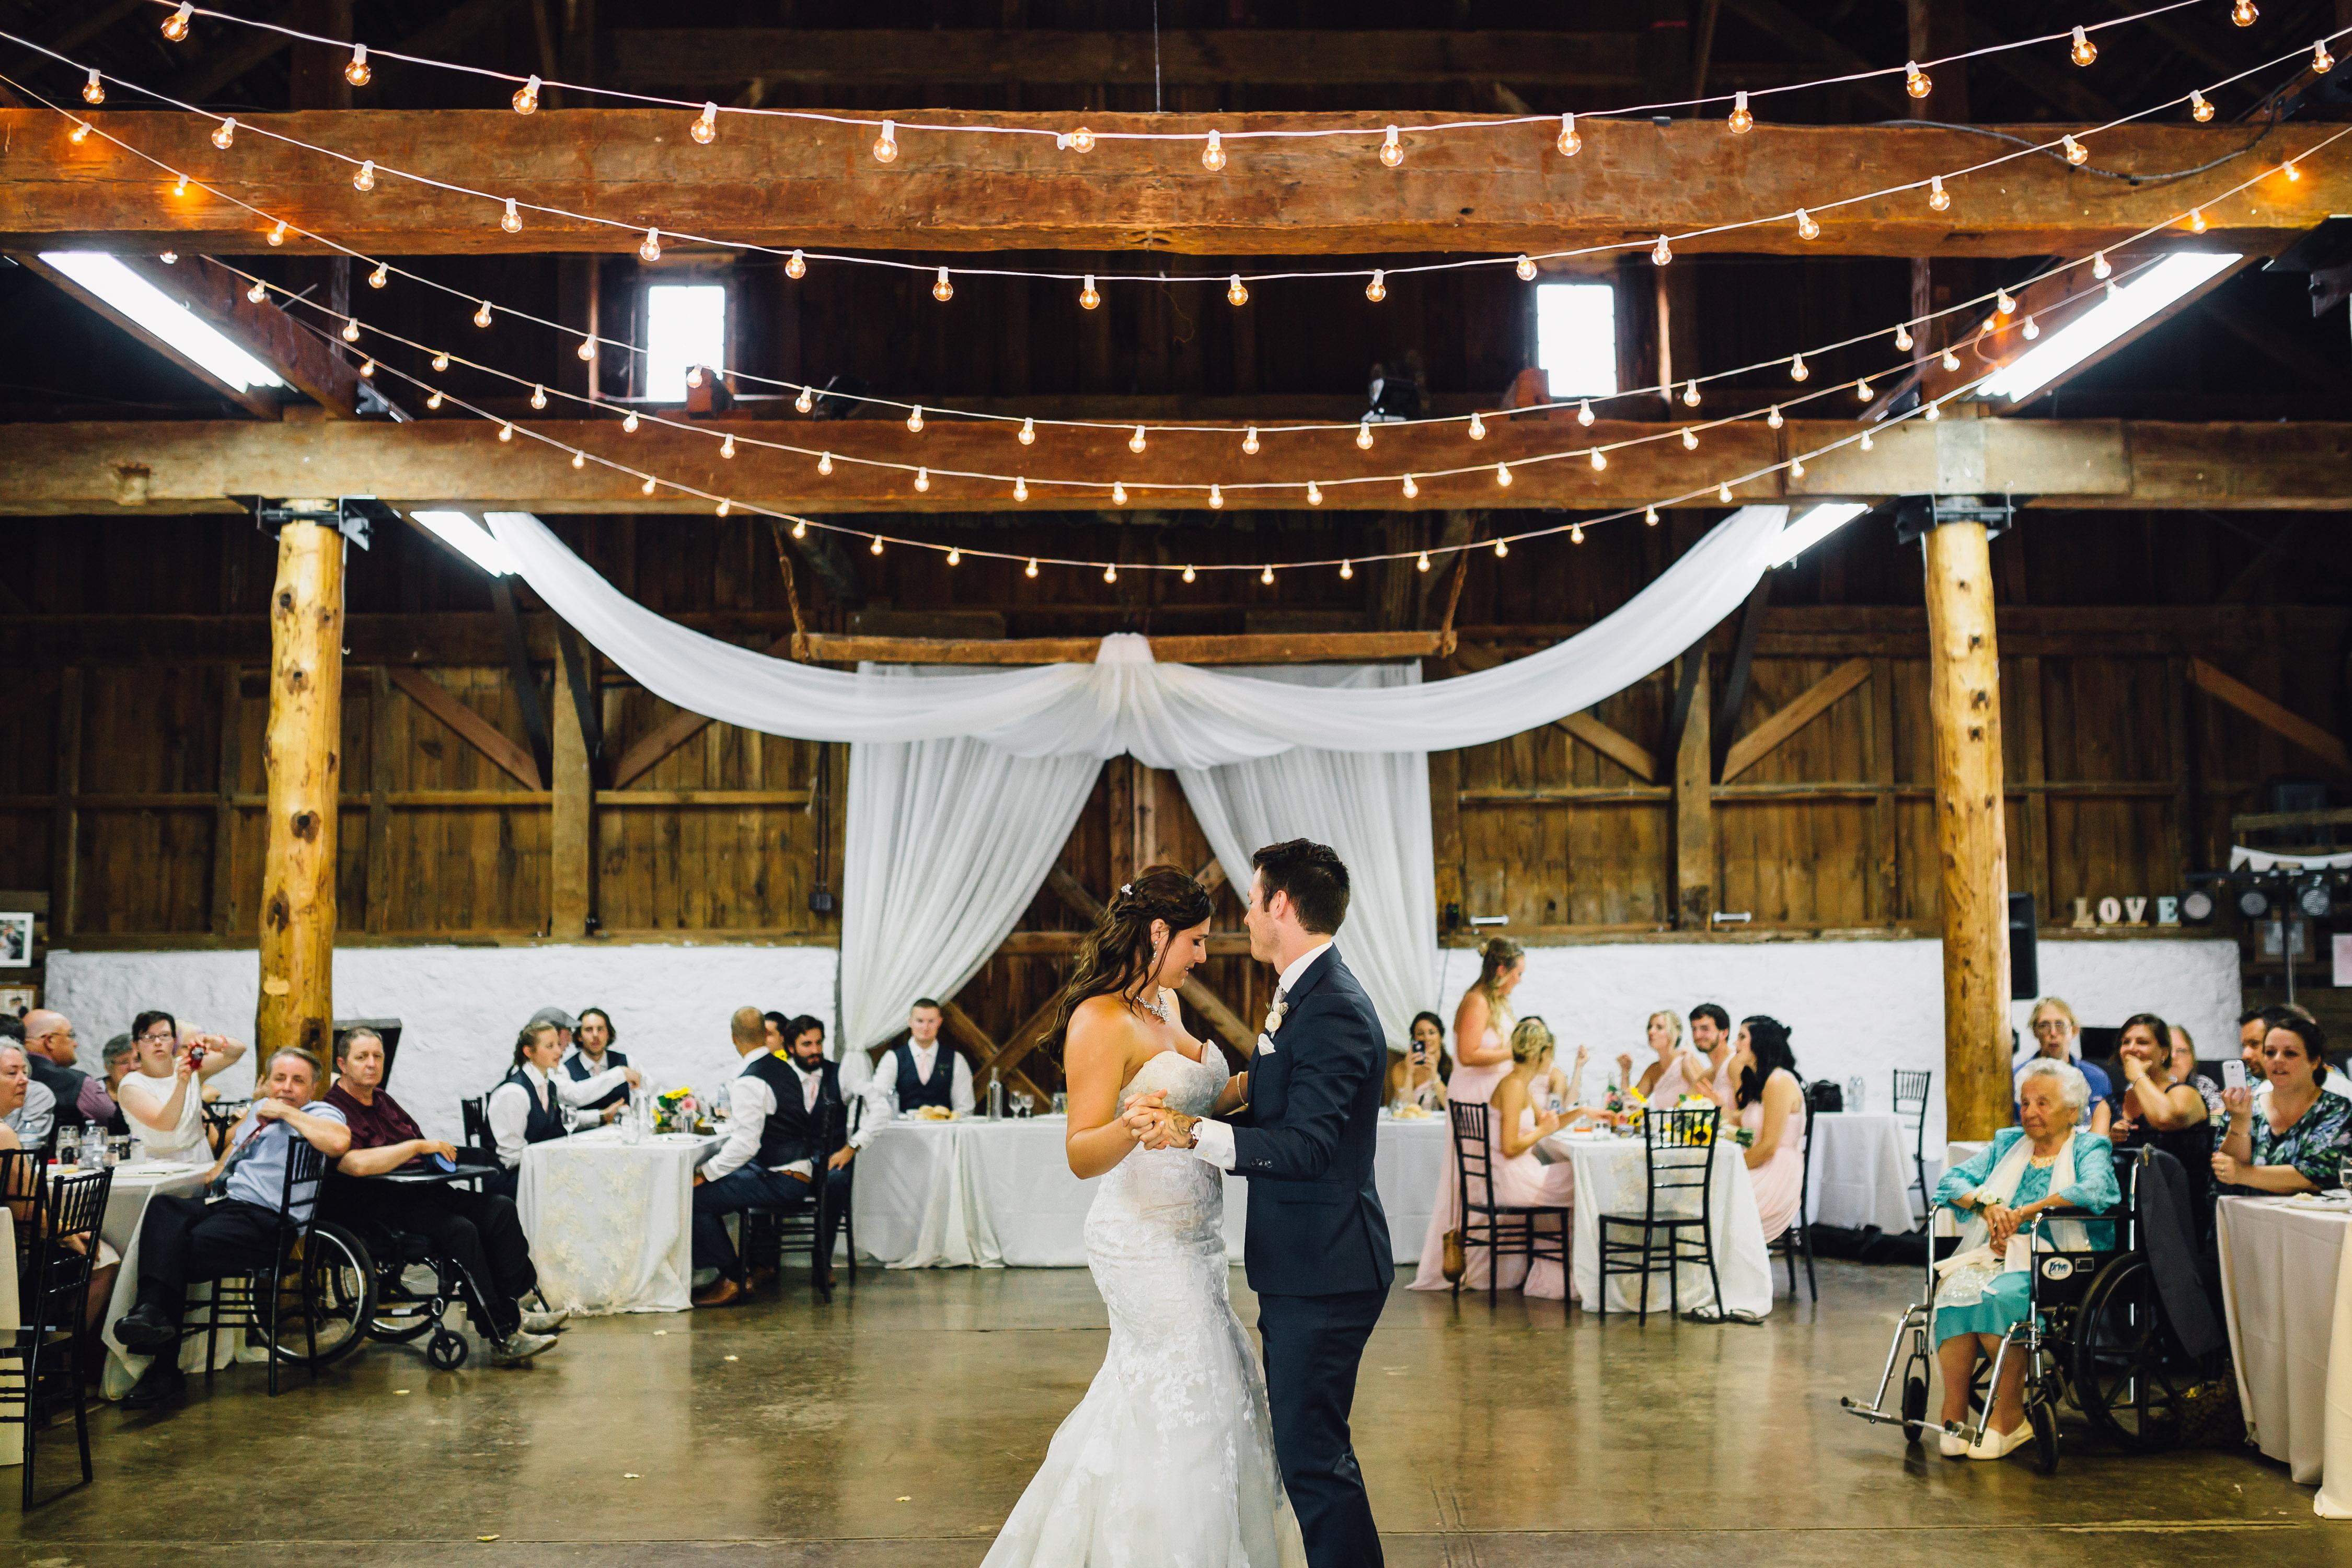 chiavari chairs wedding ceremony weird rocking reception - ball's falls jordan, ontario